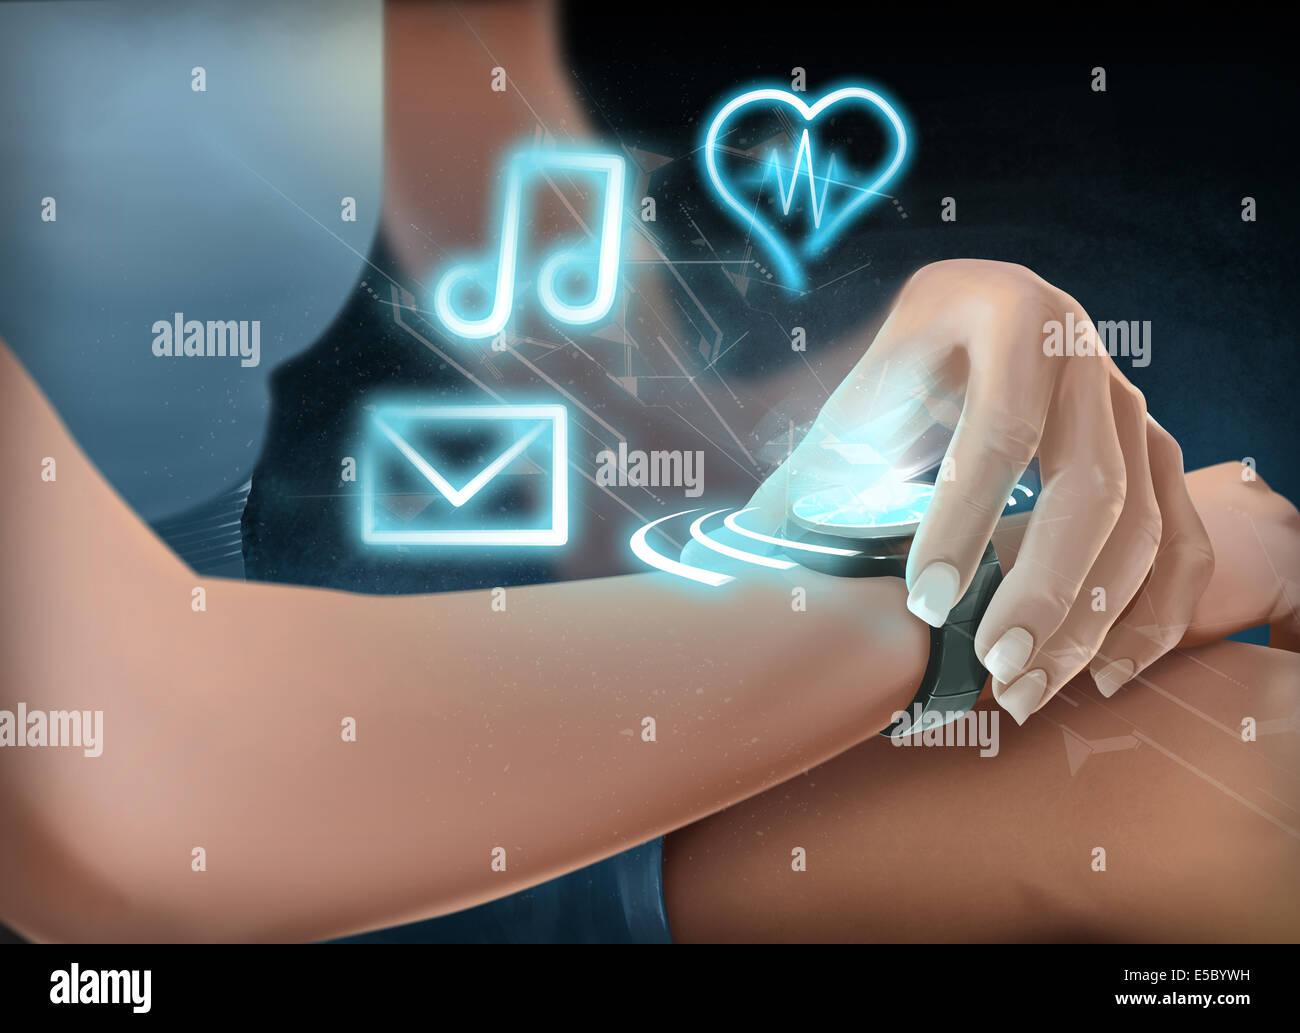 Illustration der Trägerin futuristische Armbanduhr Stockbild